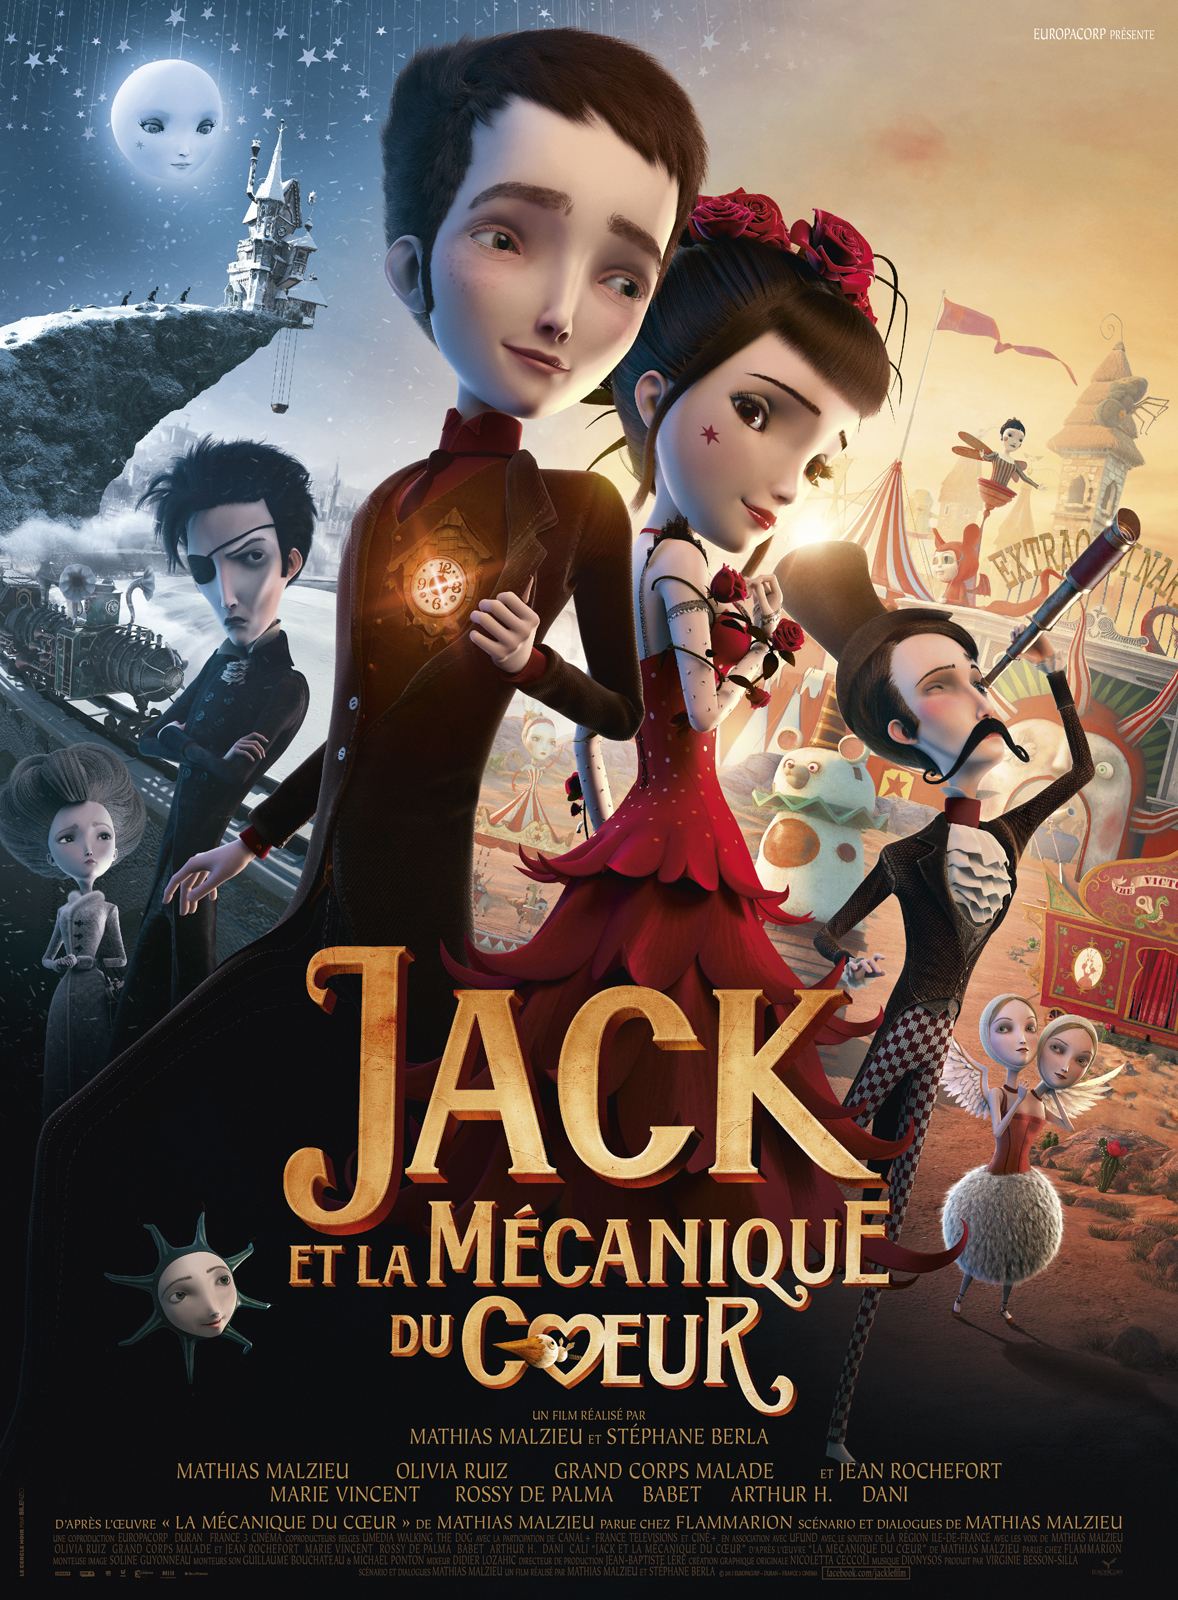 http://fr.web.img5.acsta.net/pictures/13/12/03/10/19/524458.jpg